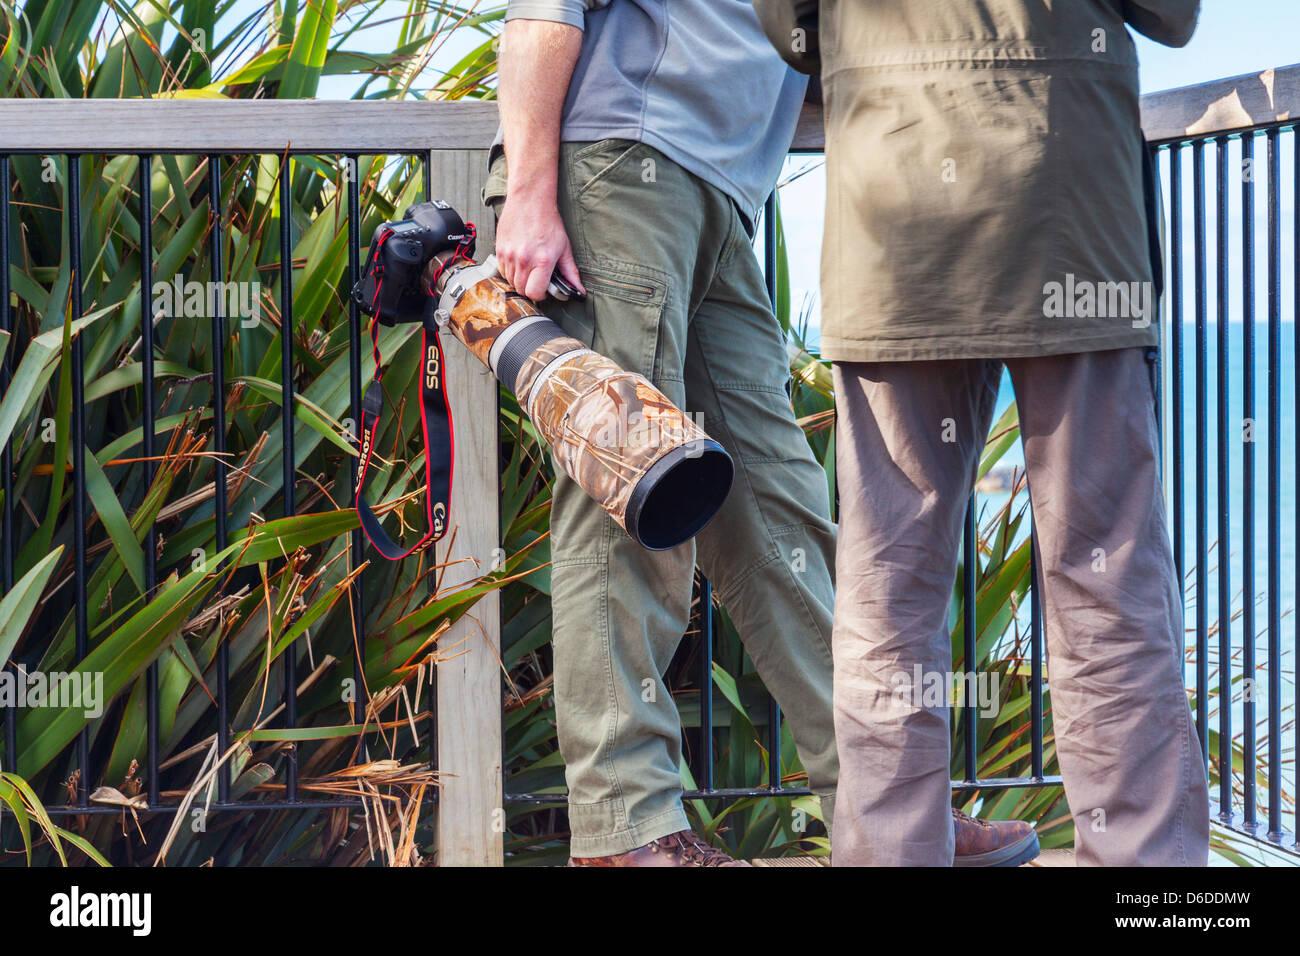 Naturfotograf mit Canon Kamera und enorme Objektiv mit Wrap-Tarnung. Stockbild